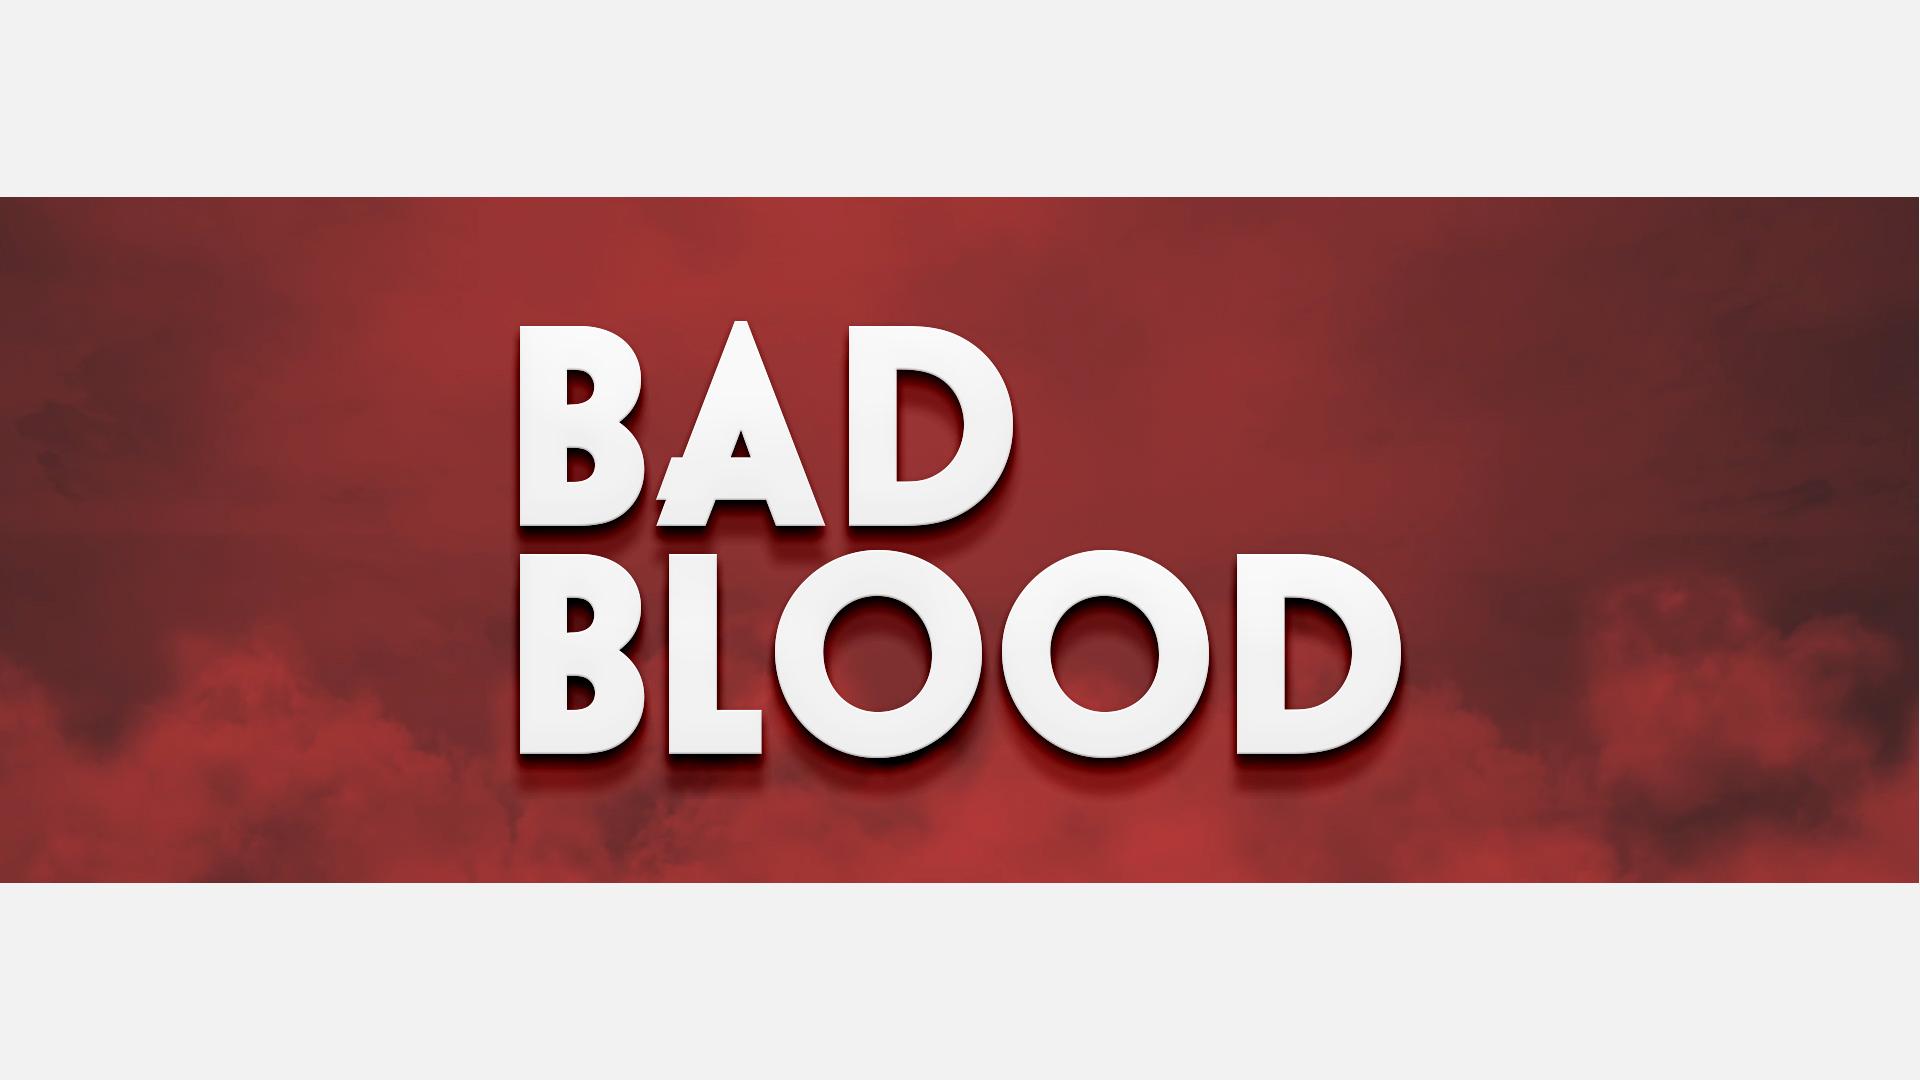 Bad Blood Title.jpg